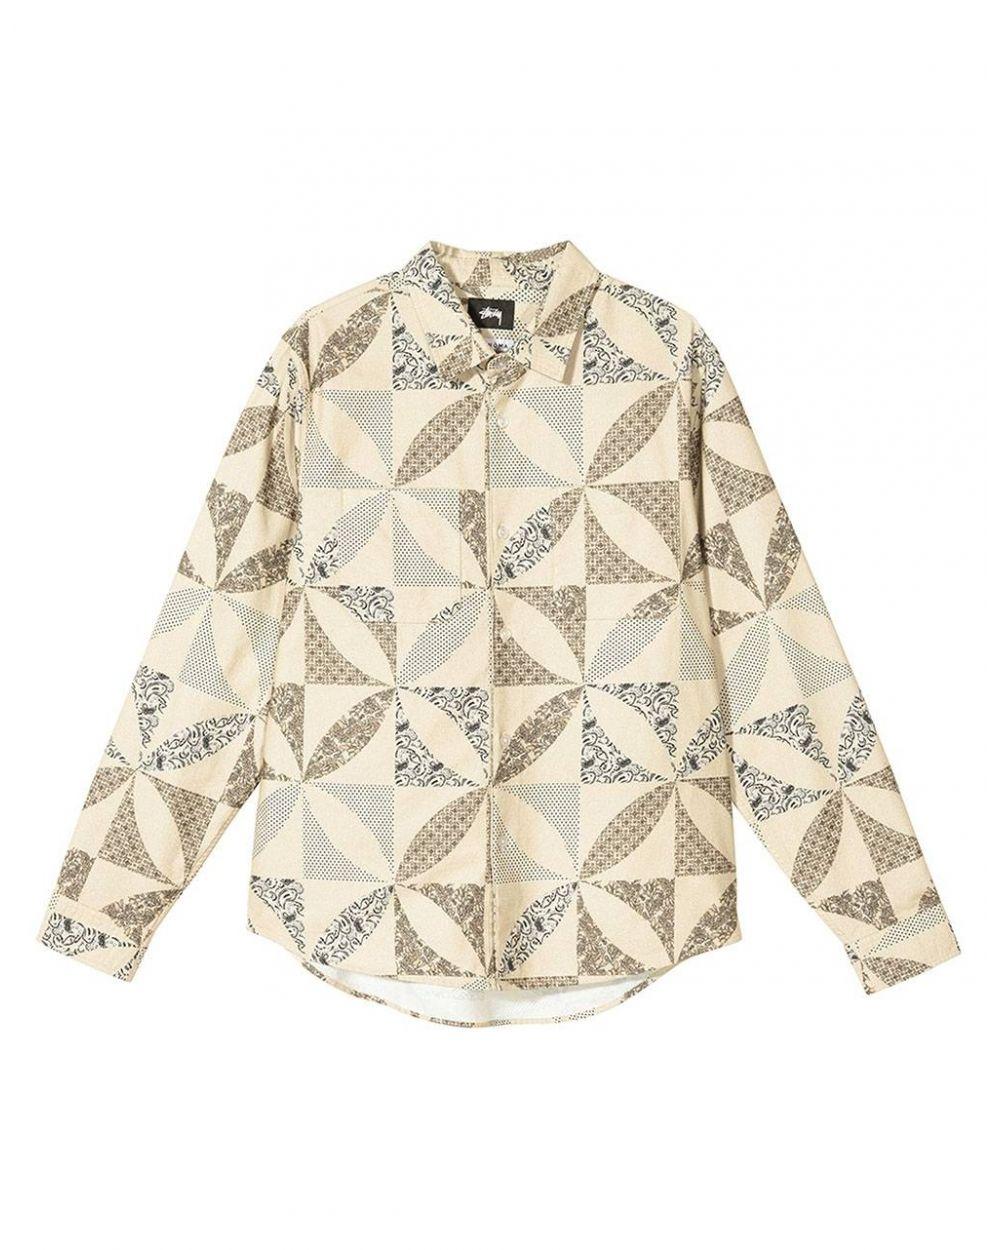 Stussy quilt pattern shirt - sand Stussy Shirt 179,00€